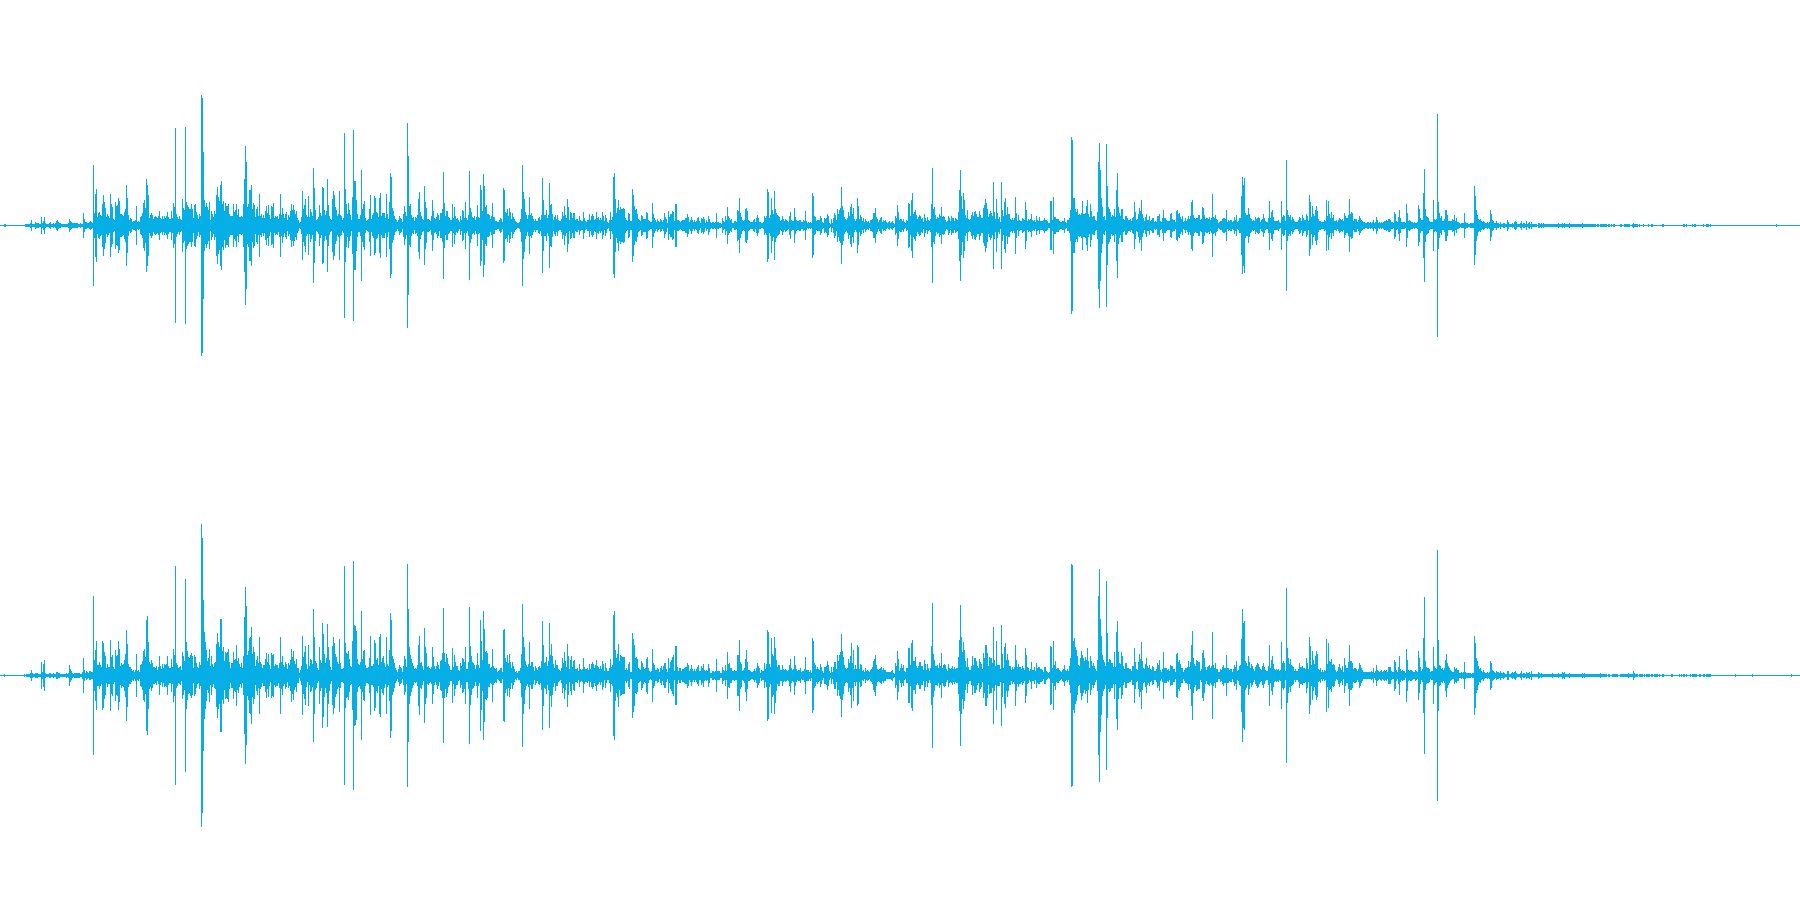 ASMR 熱いお湯をコップに注ぐ音の再生済みの波形